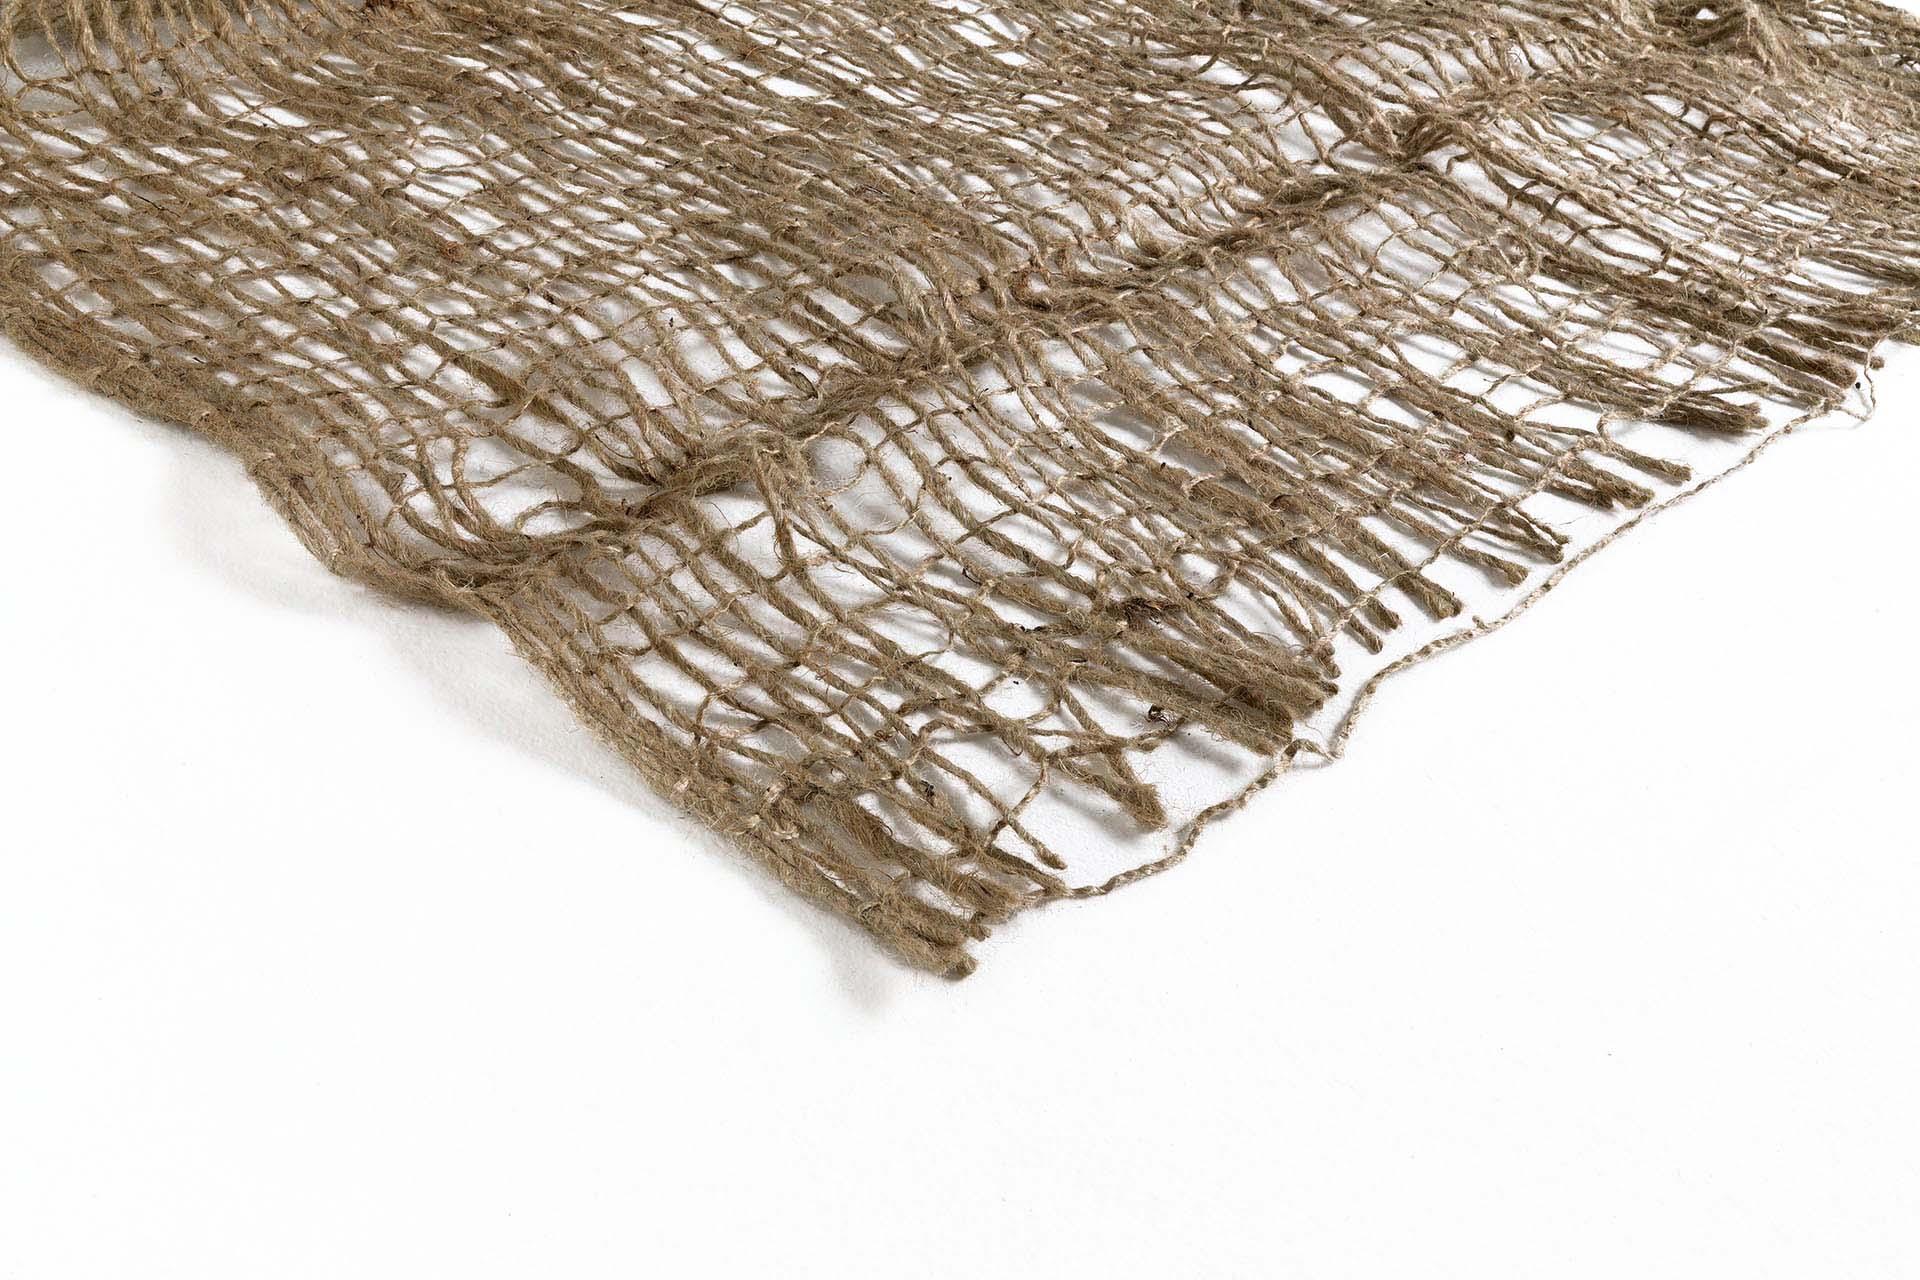 Ecovernet biomats made by juta fibers